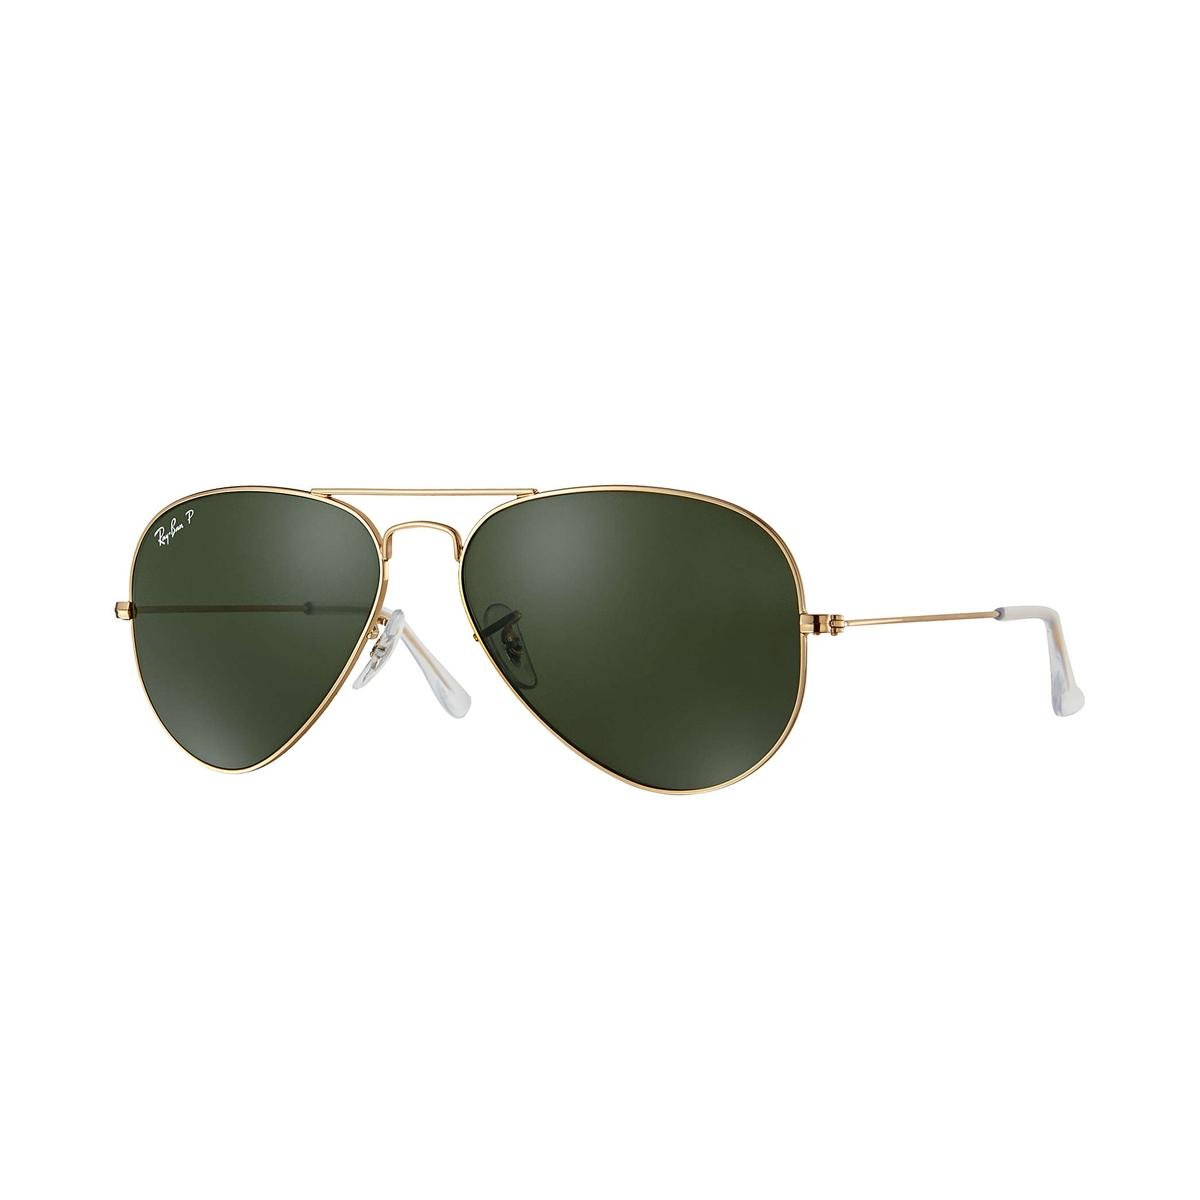 75086e79b9cb0 Óculos de Sol Ray-Ban Aviator Clássico - Dourado - Compre Agora ...